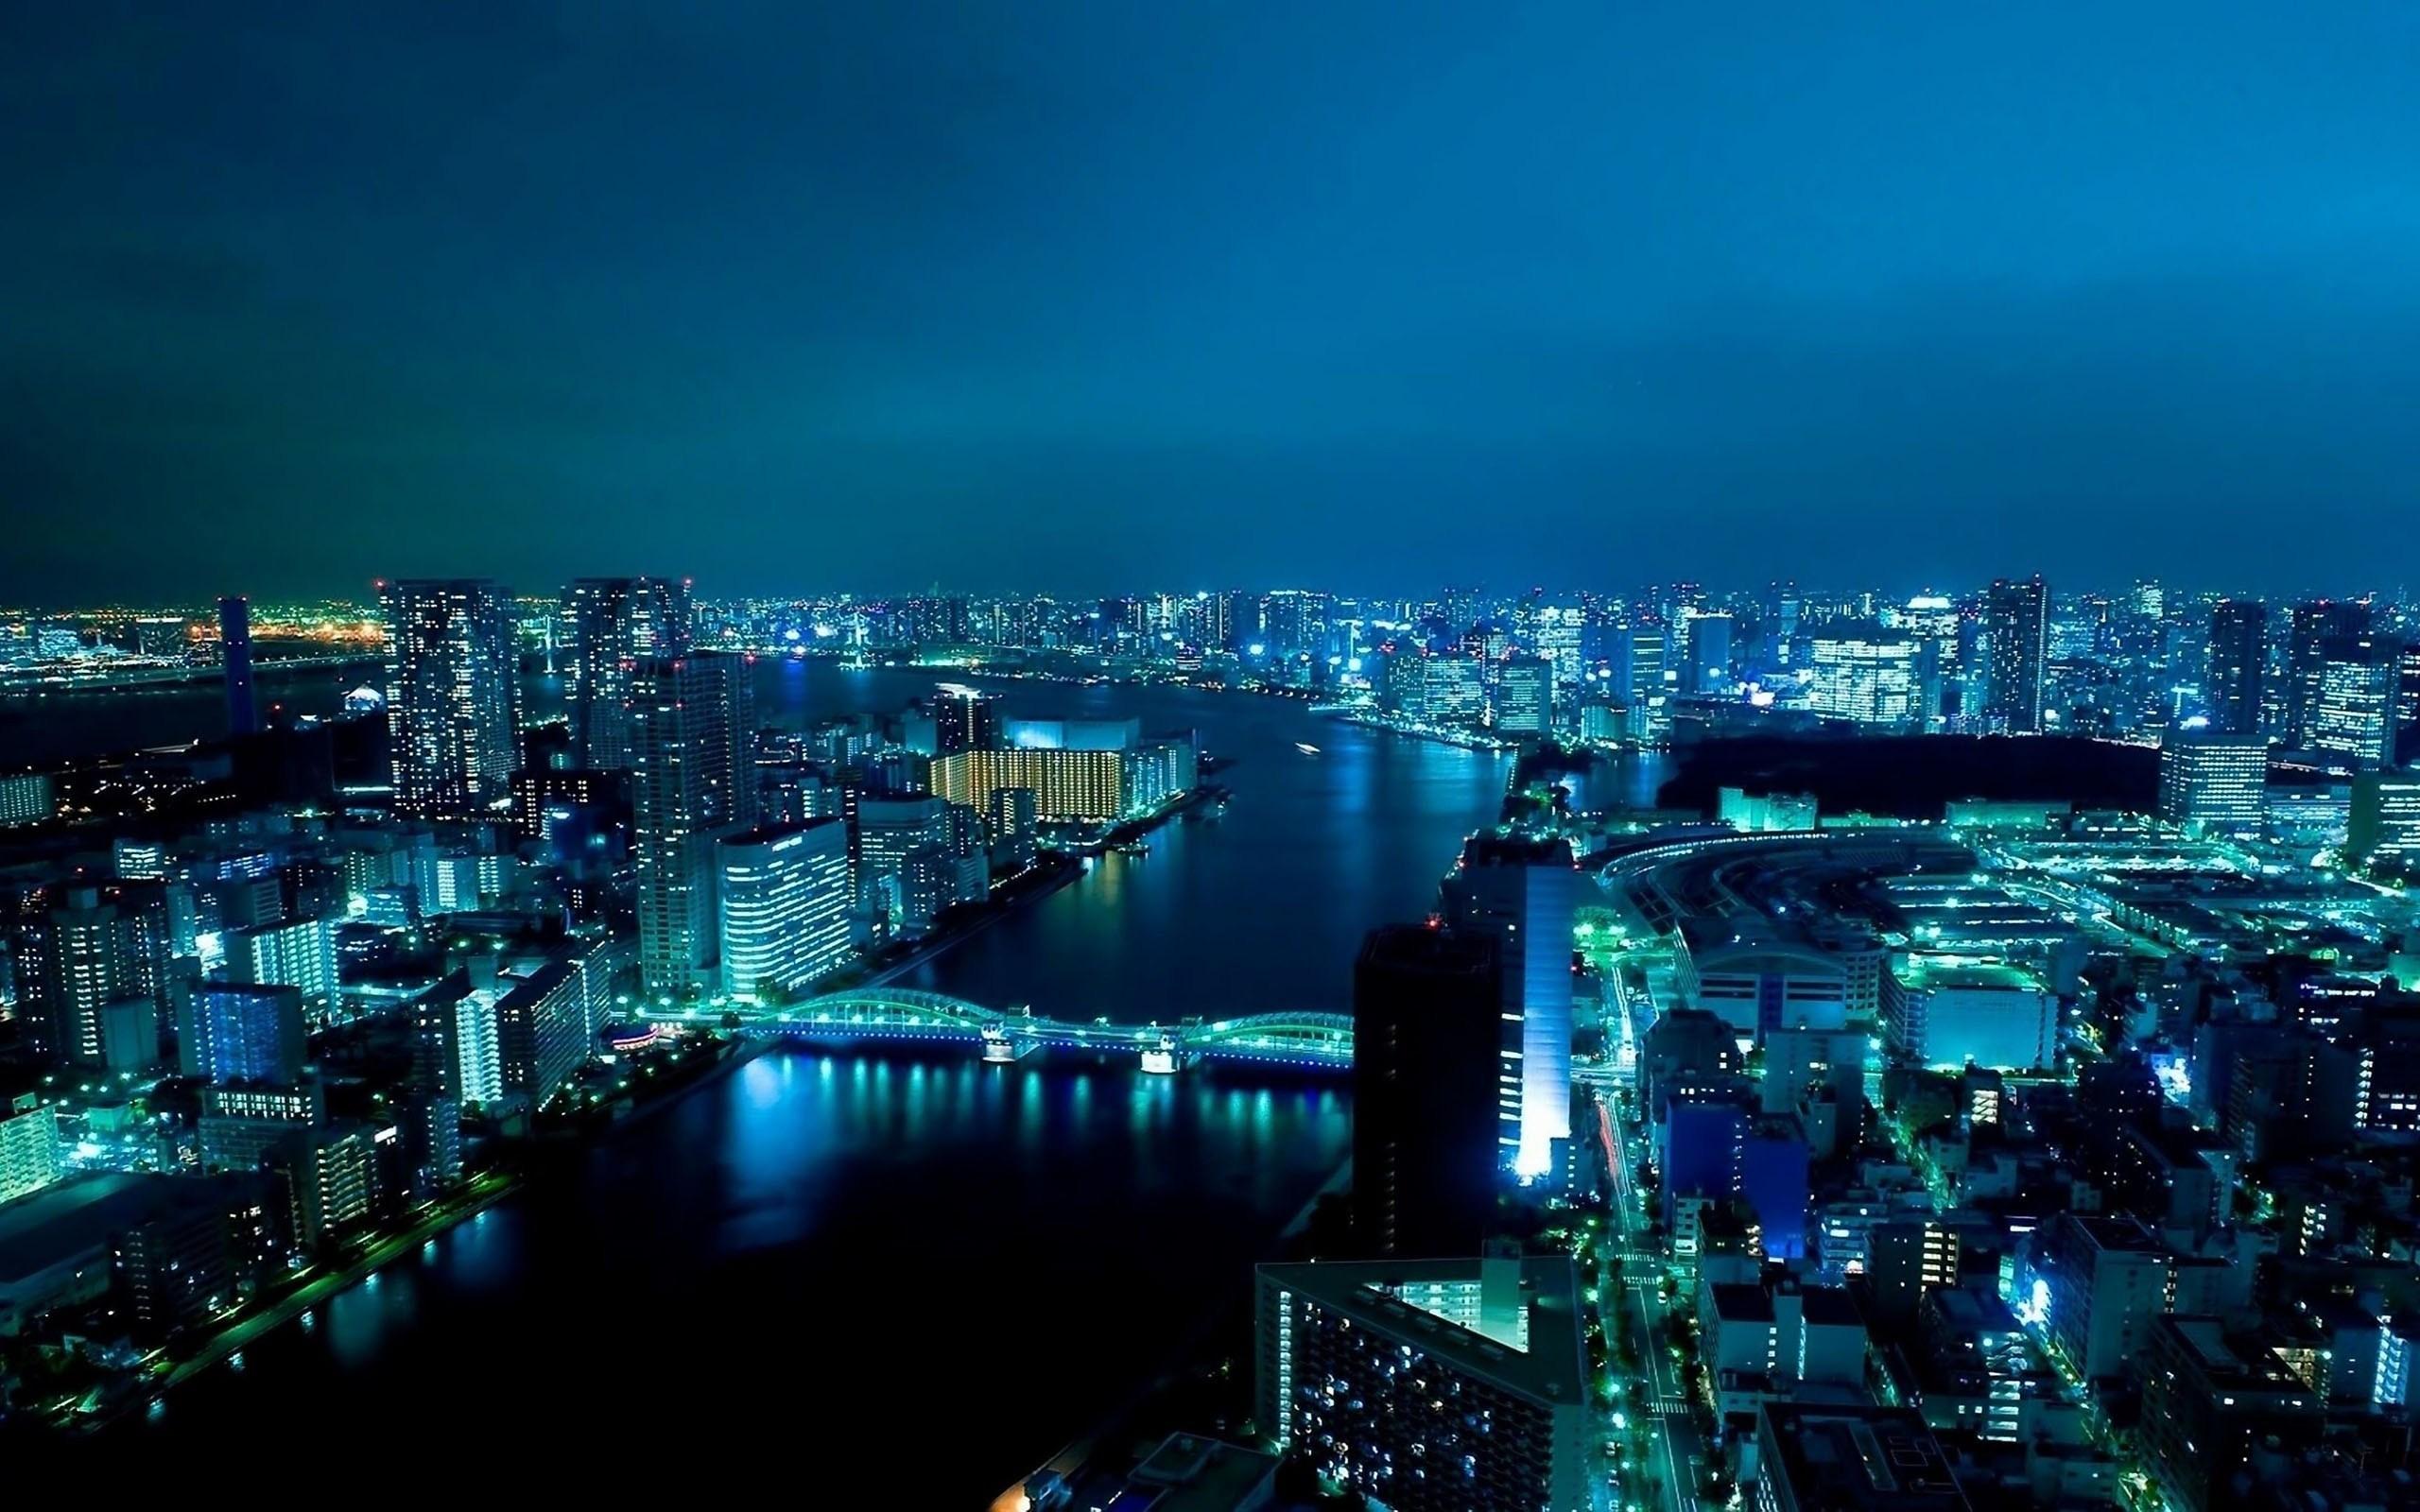 Tokyos surprising lack of density   Market Urbanism 2560x1600